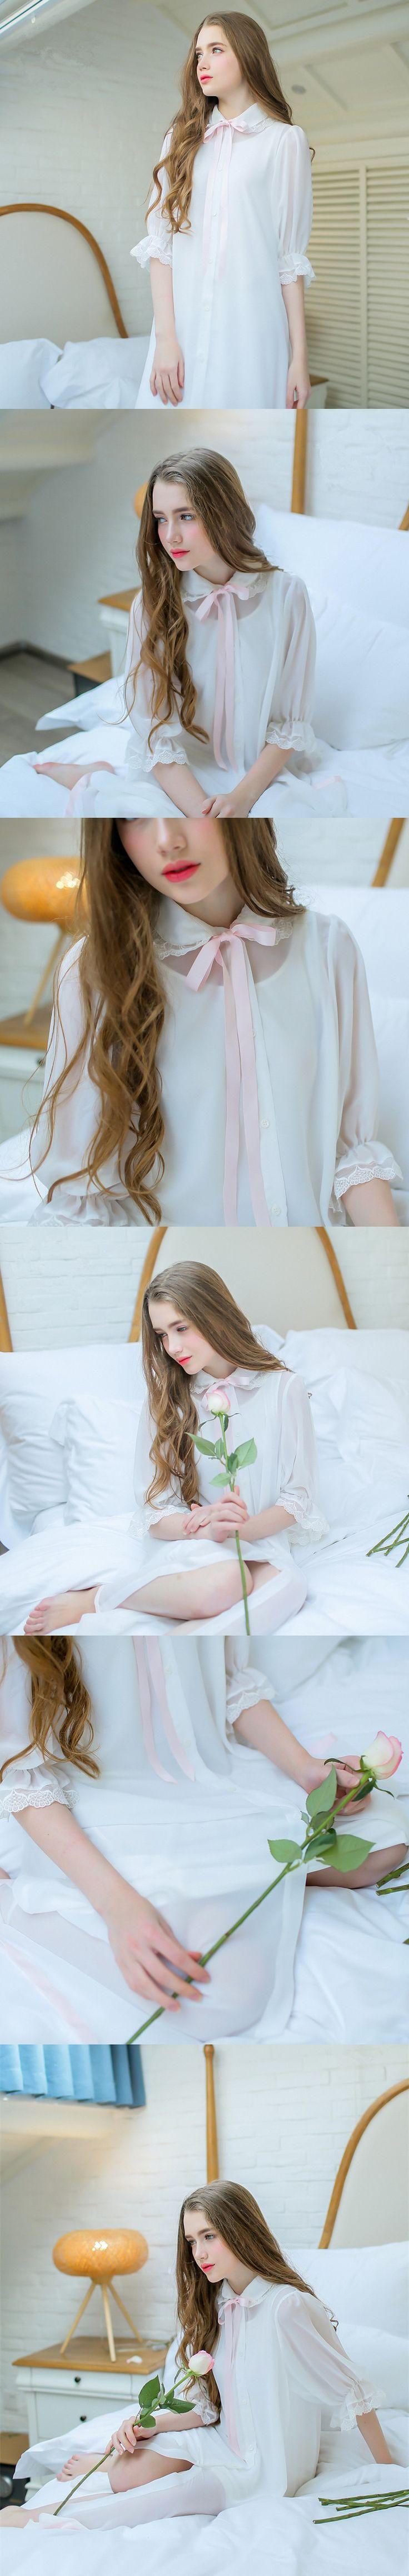 46 best Sweet Dreams Zzzz images on Pinterest